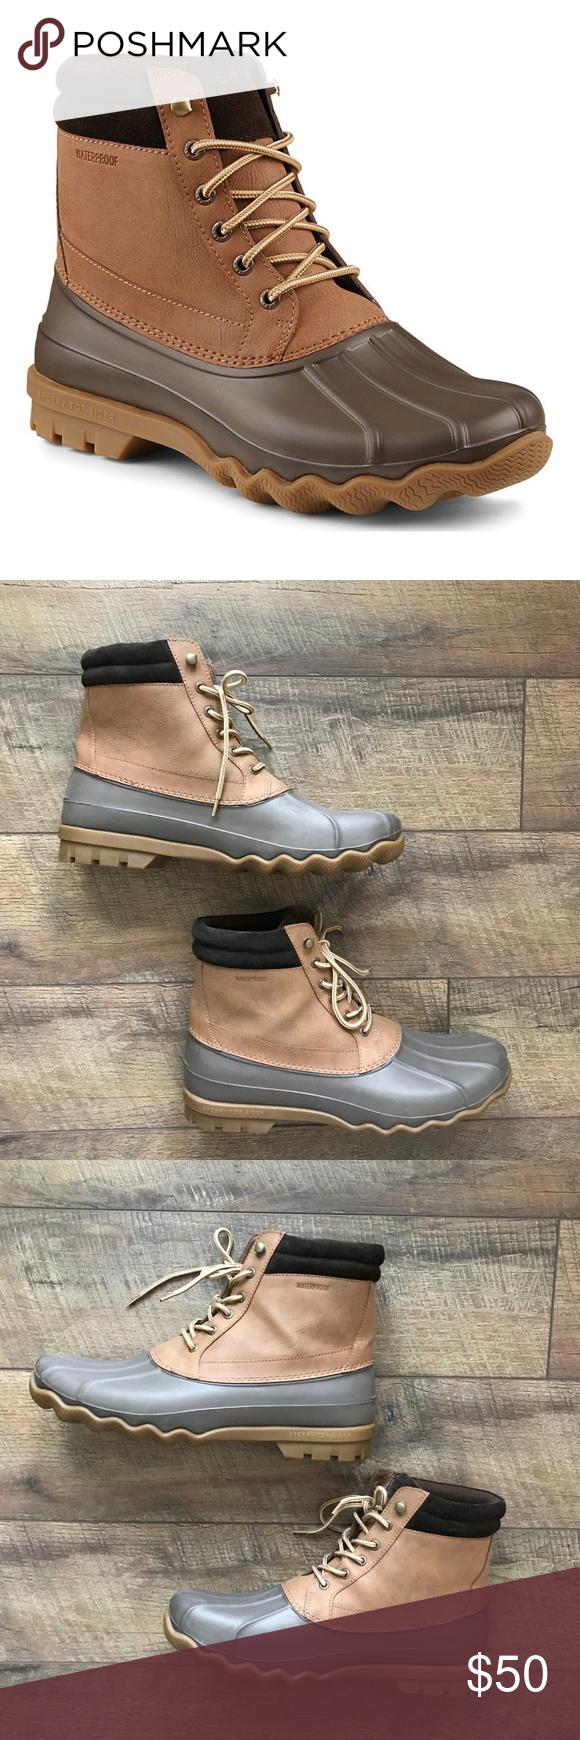 Brewster Waterproof Duck Boot sz